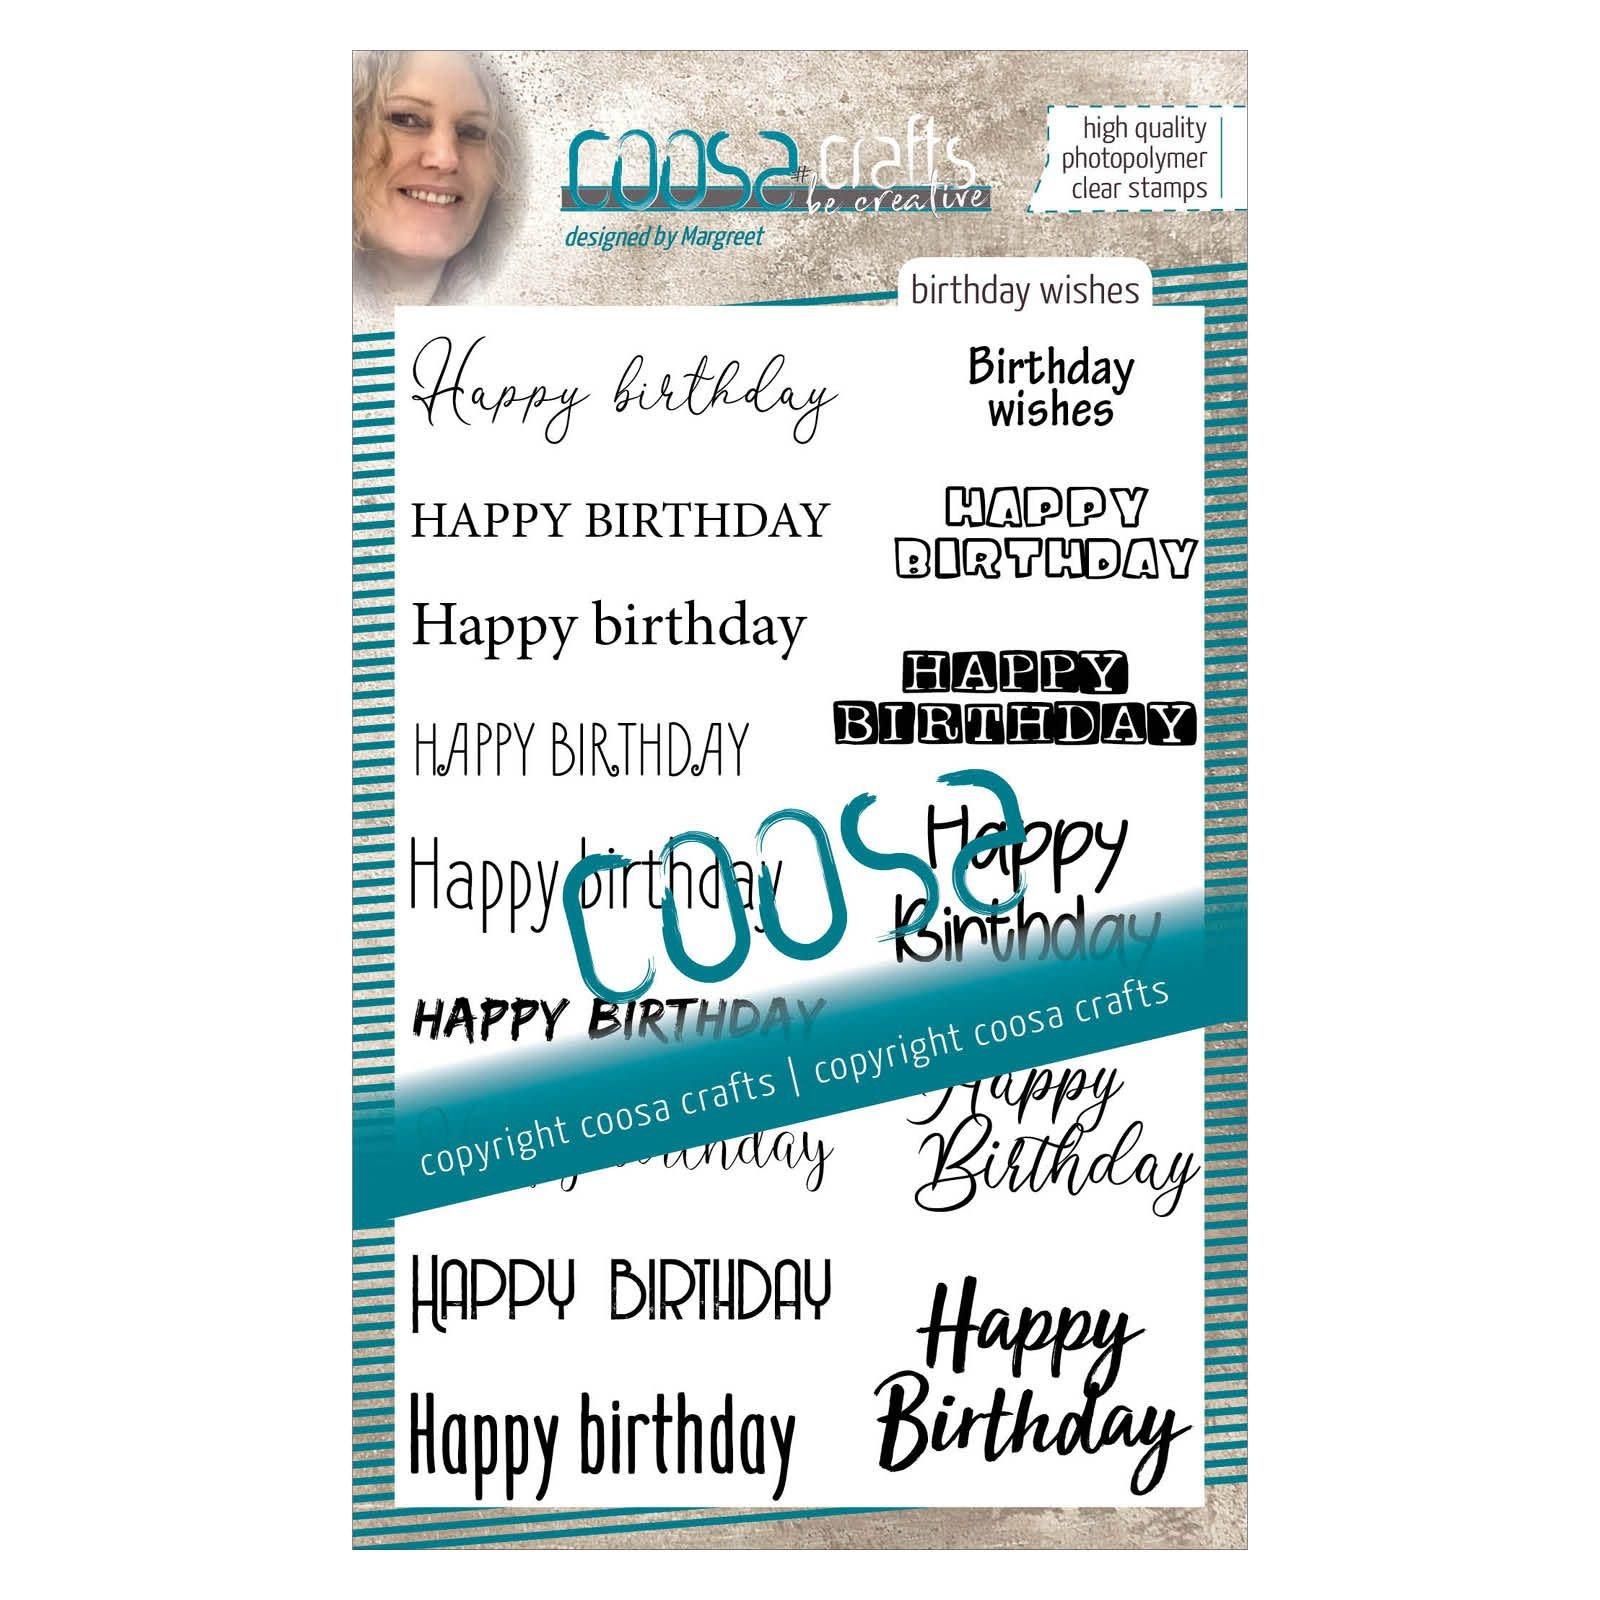 Coosa Coosa birthday wishes coc071